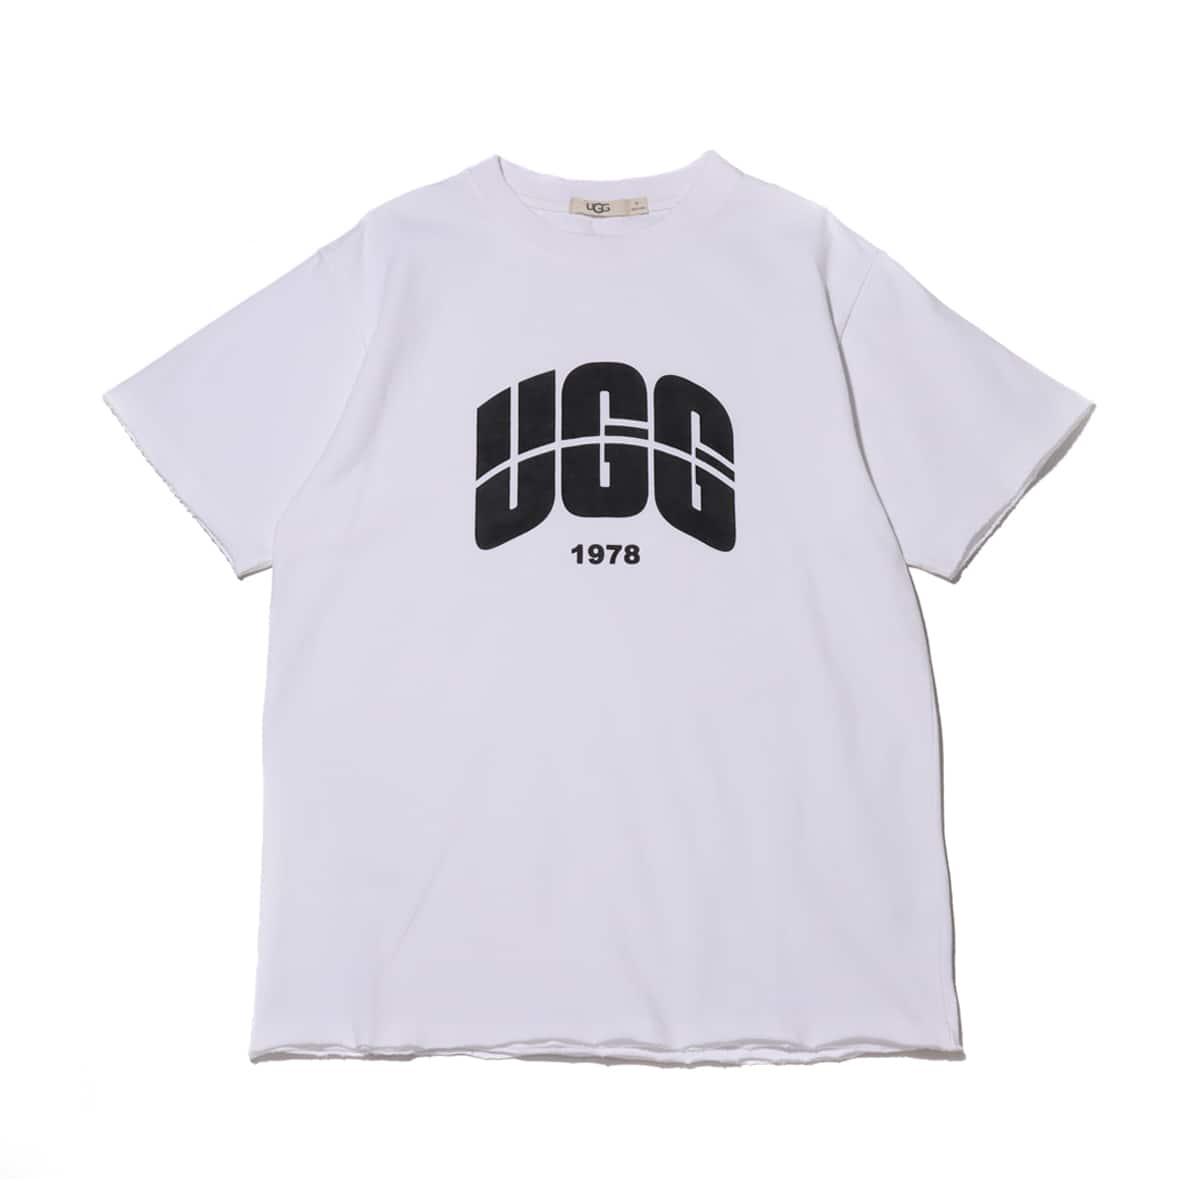 UGG ロゴアレンジ Tシャツ WHITE 21SP-I_photo_large